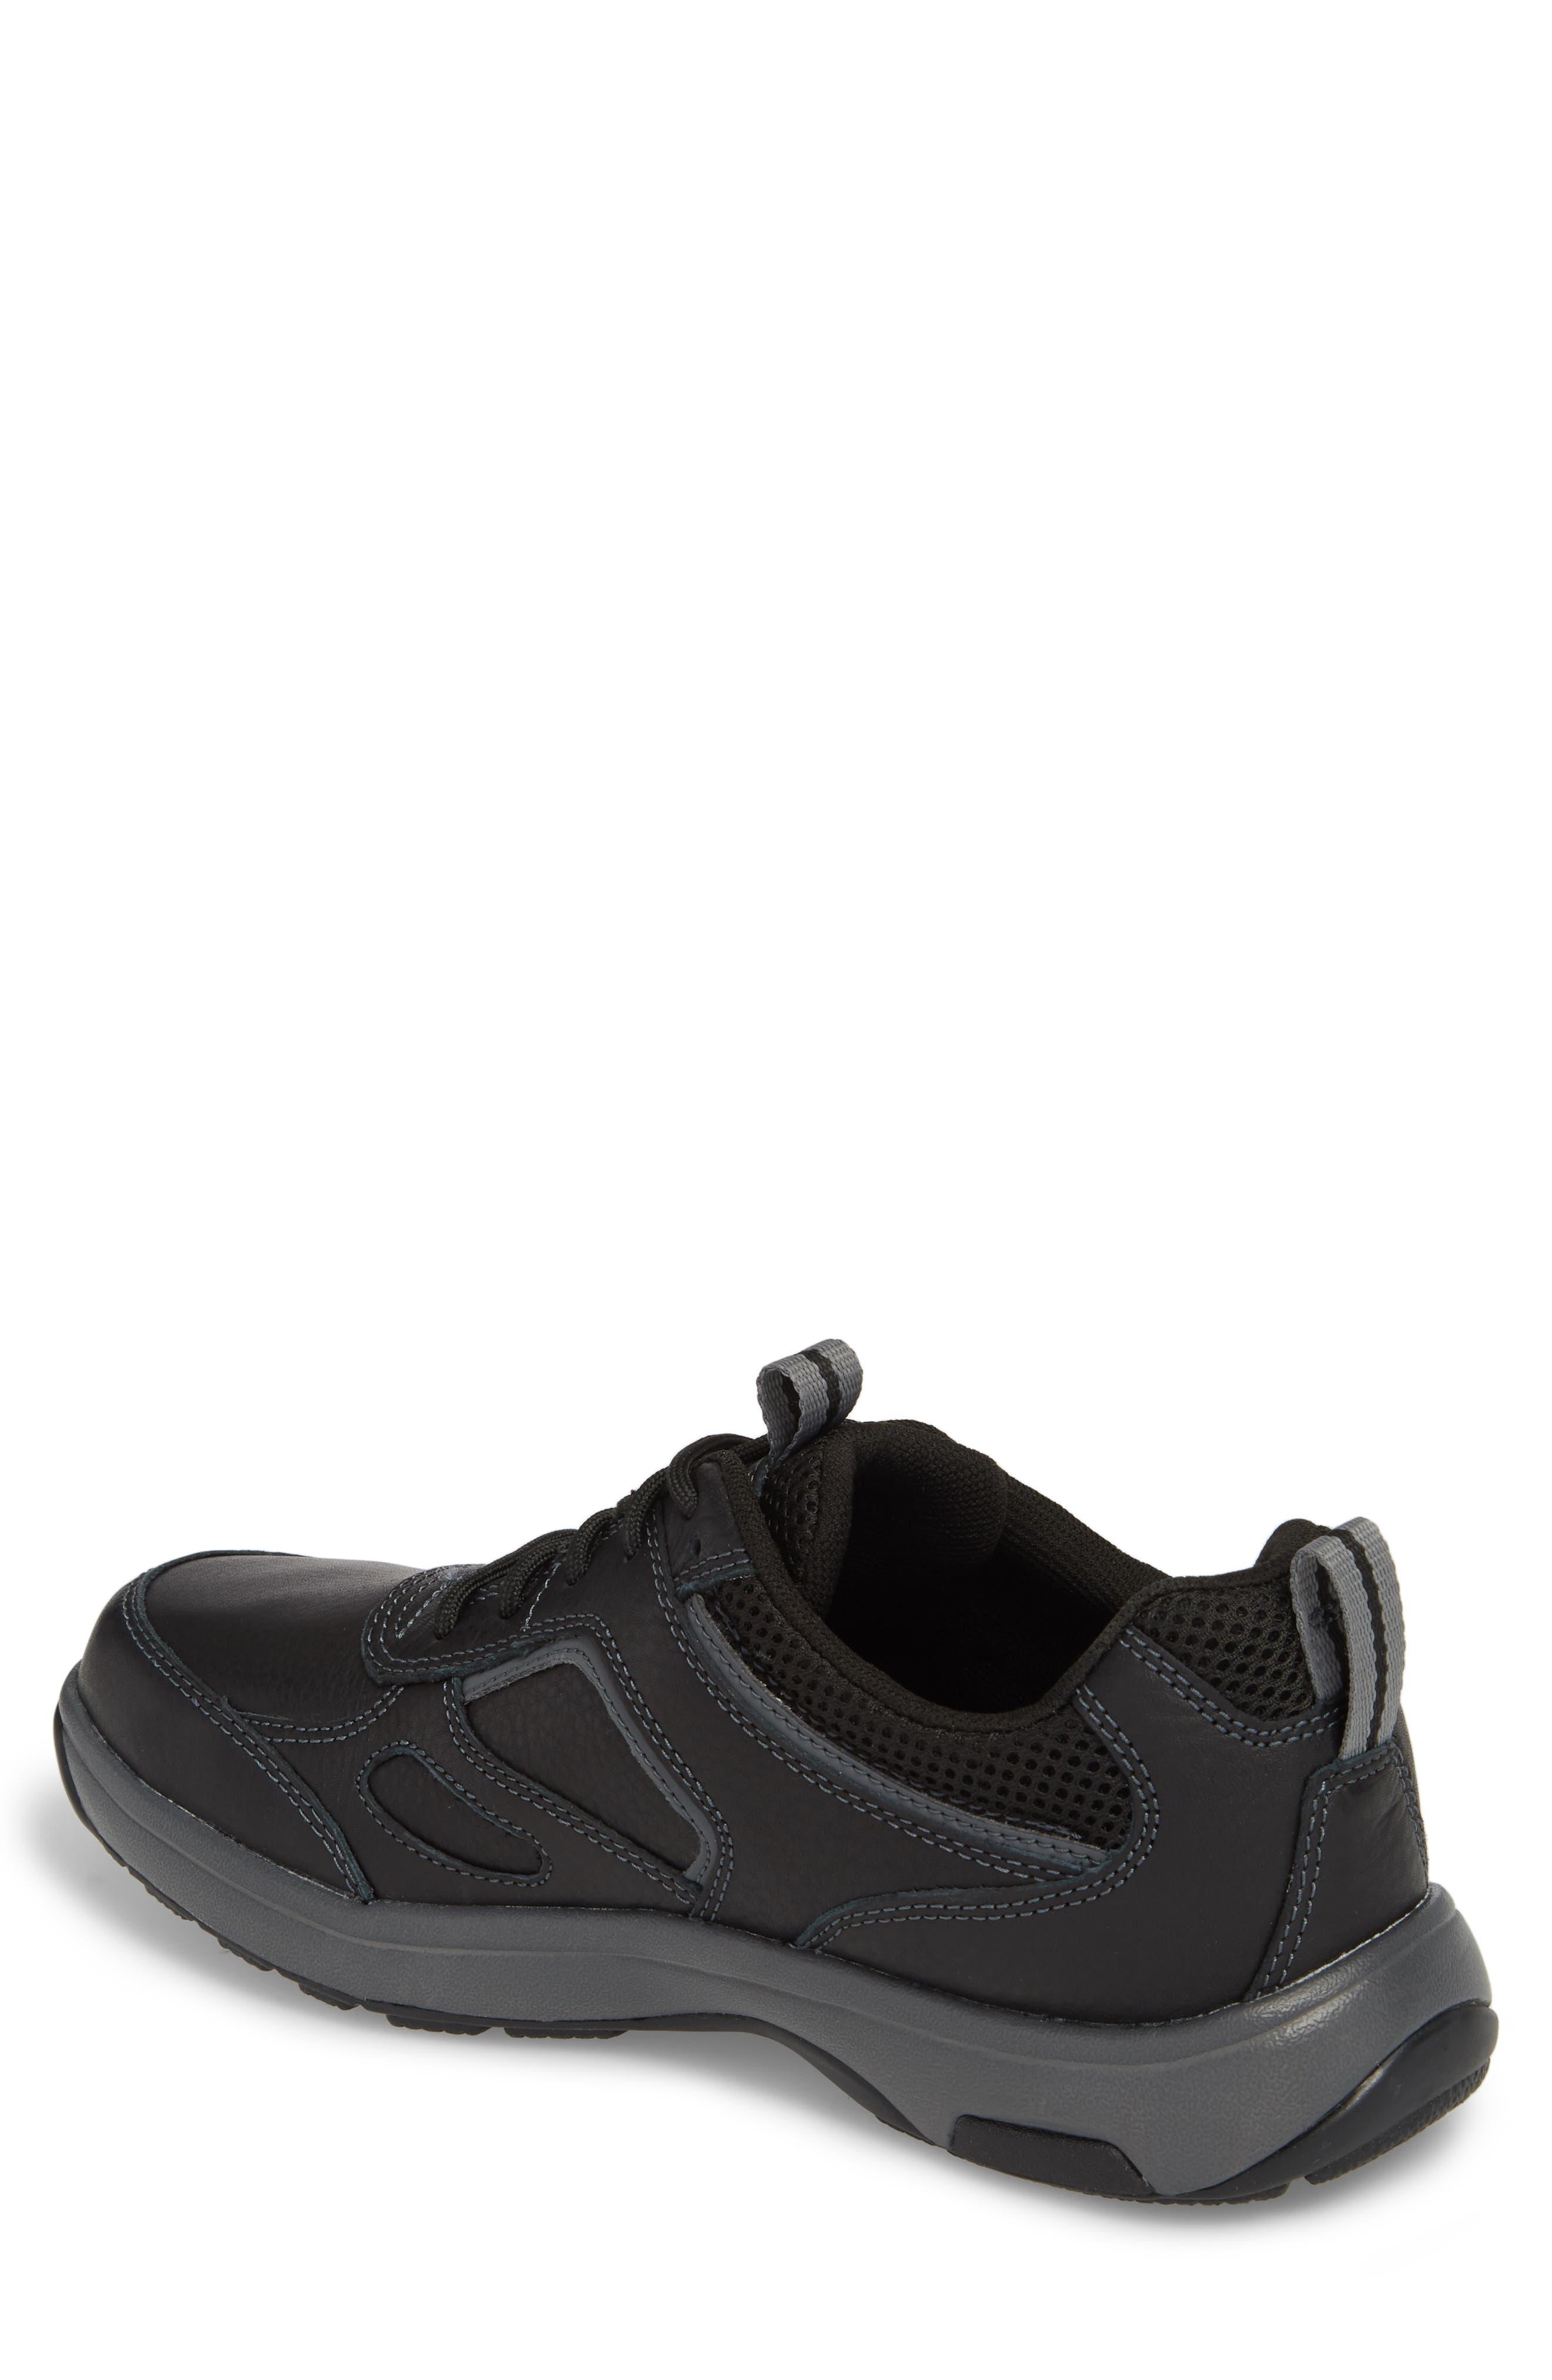 8000 Uball Sneaker,                             Alternate thumbnail 2, color,                             001